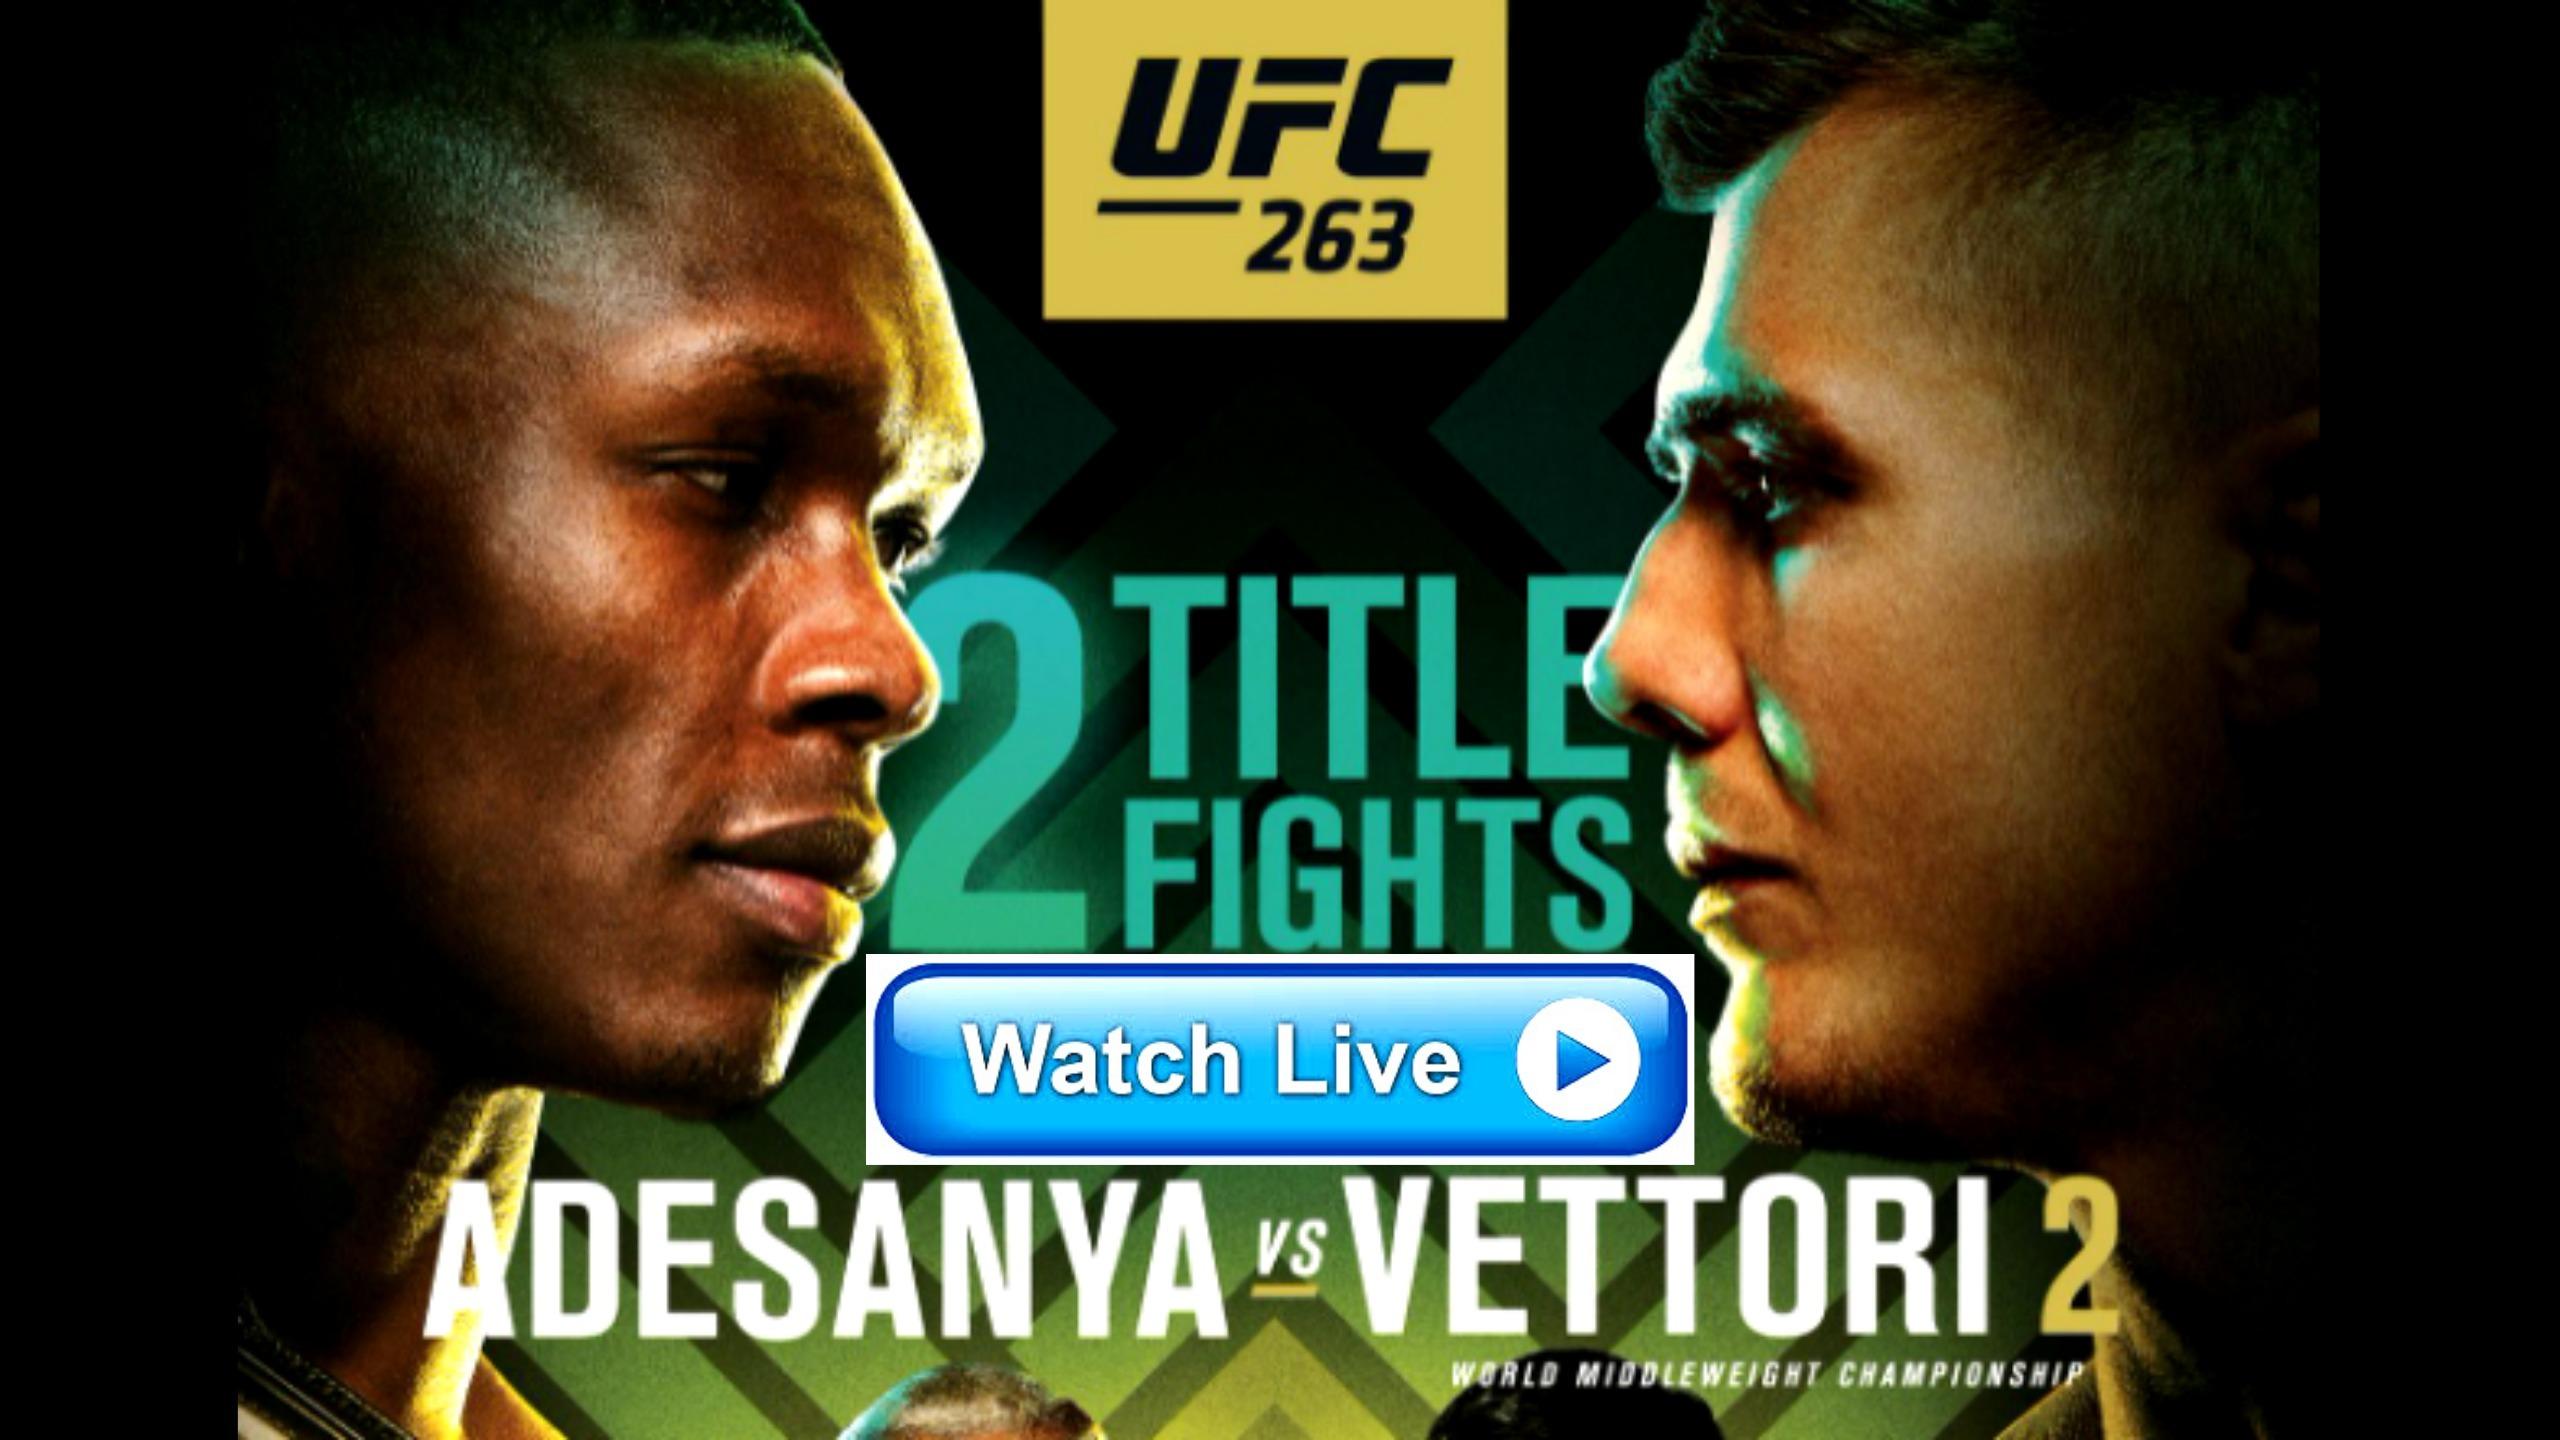 Adesanya vs. Vettori 2 Live Stream Free (@adesanyavsvettori2livestream) Cover Image